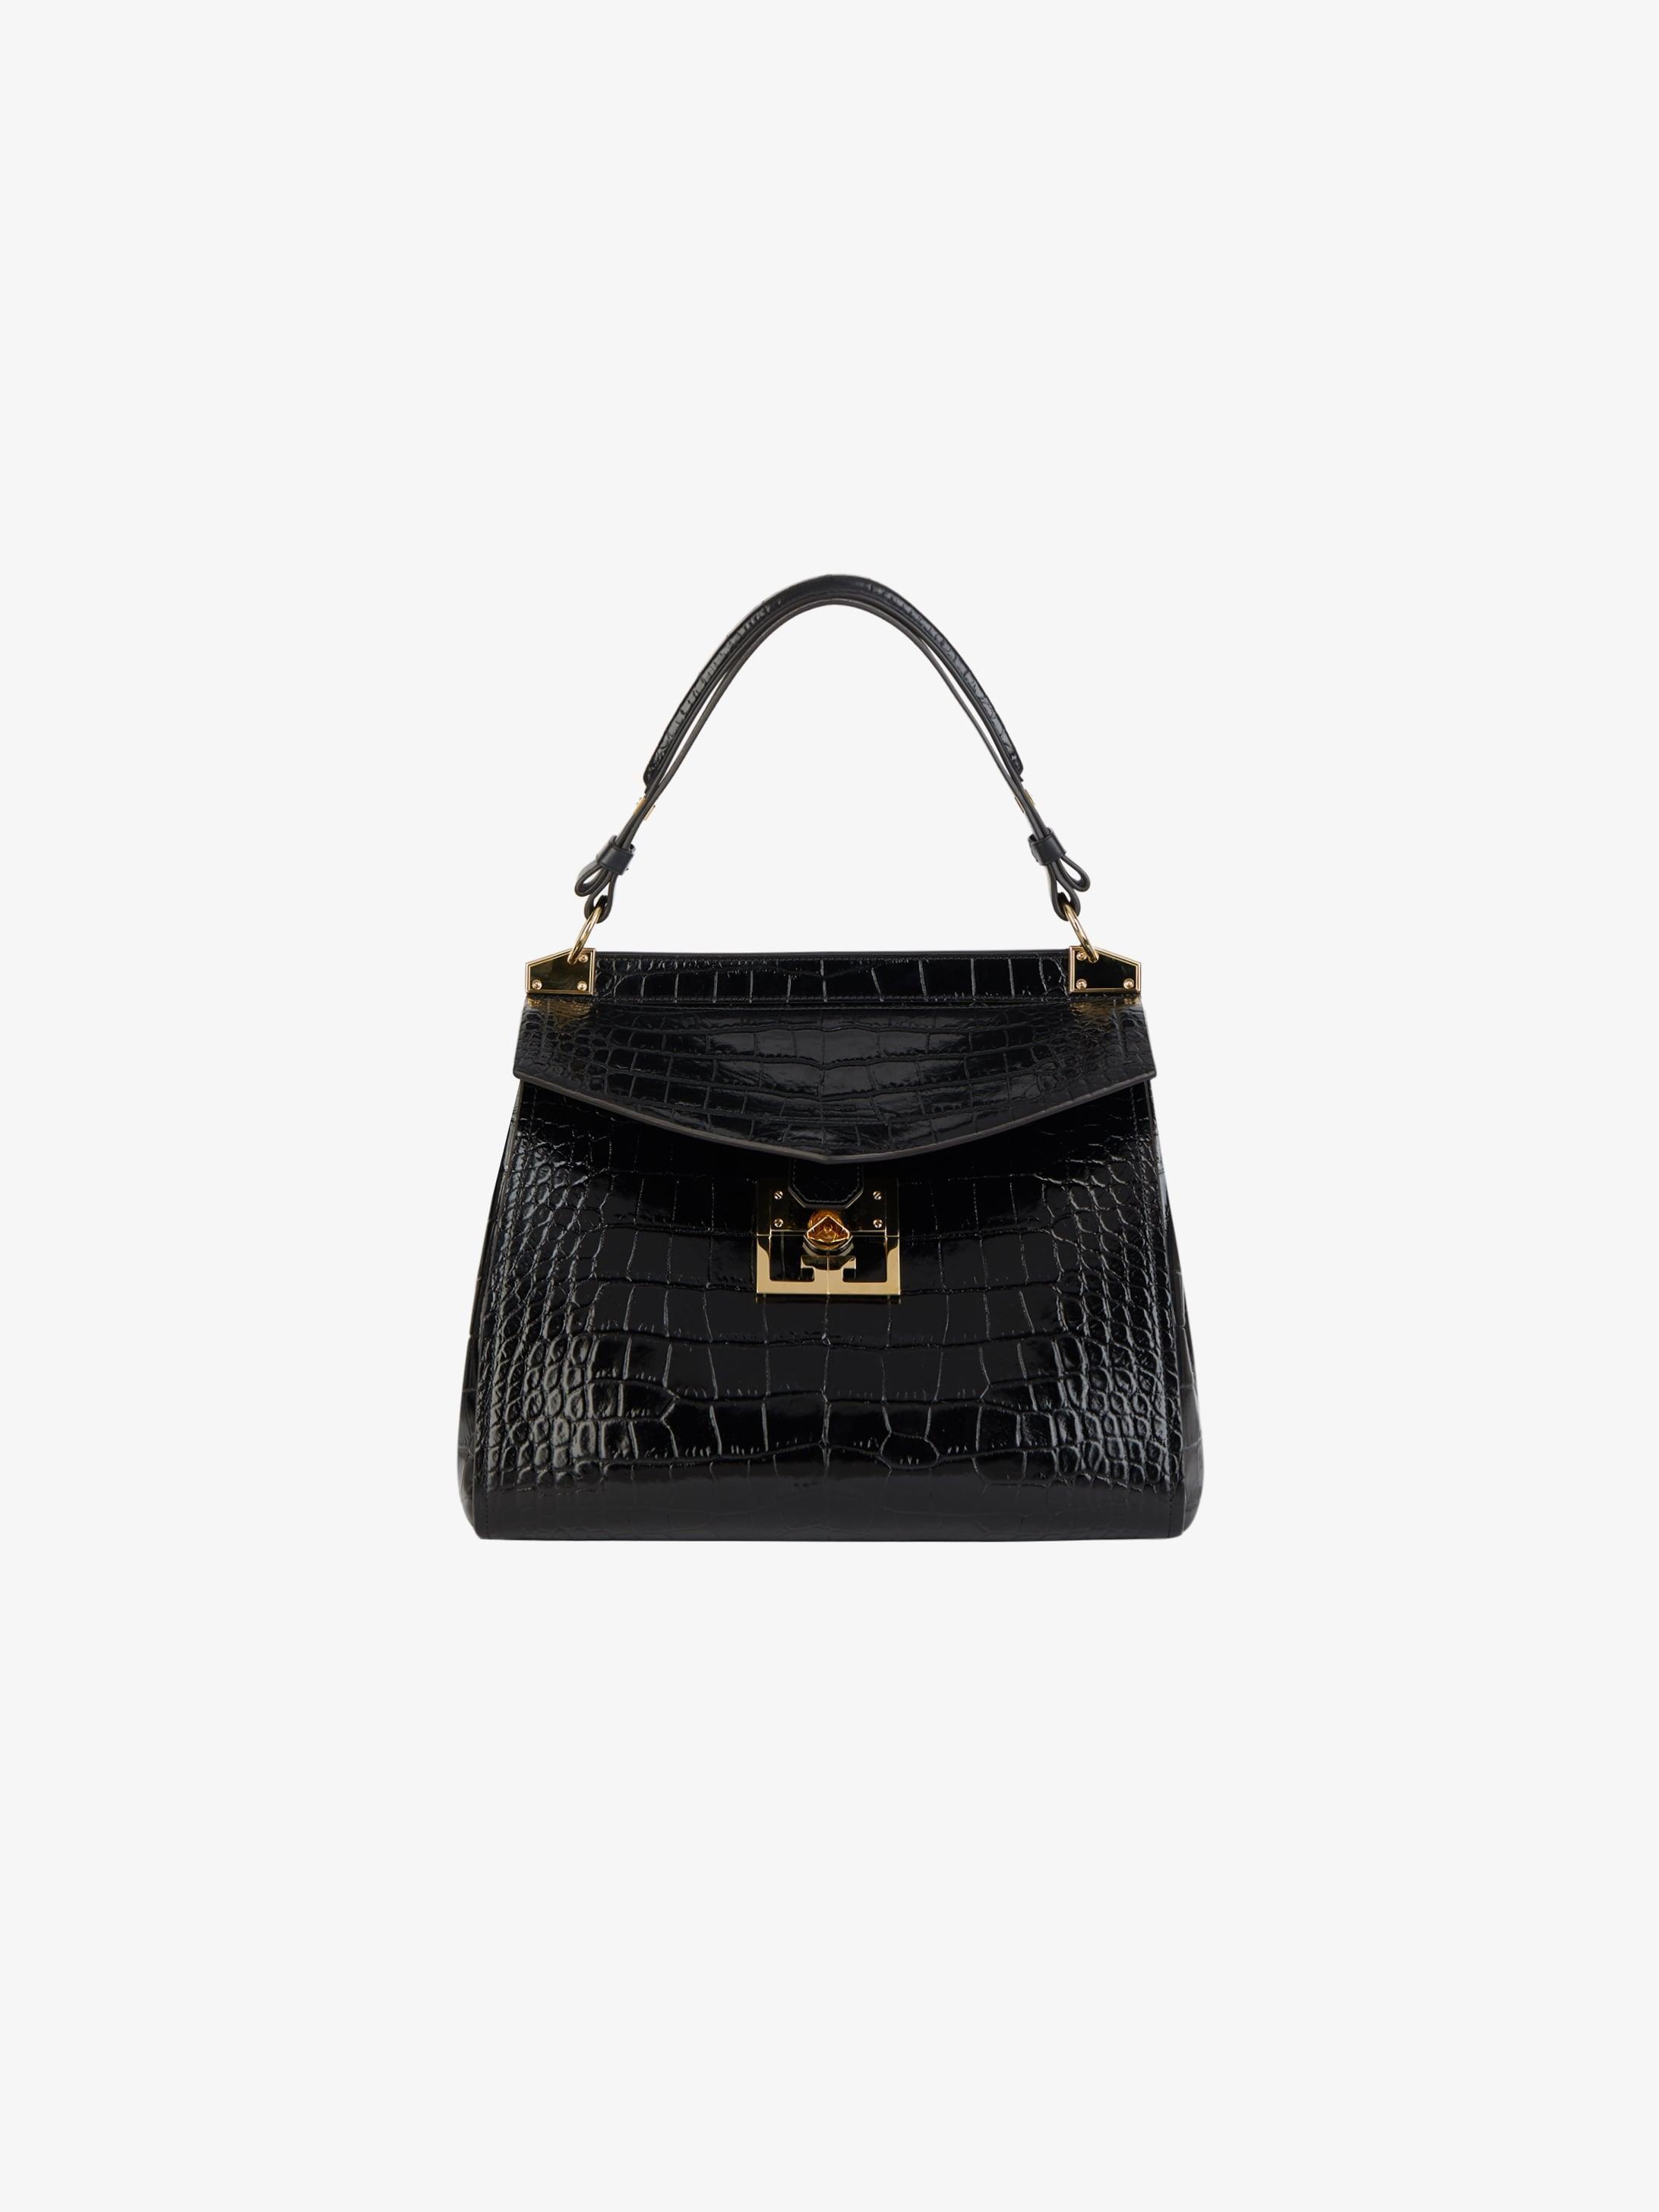 Medium Mystic bag in crocodile effect leather